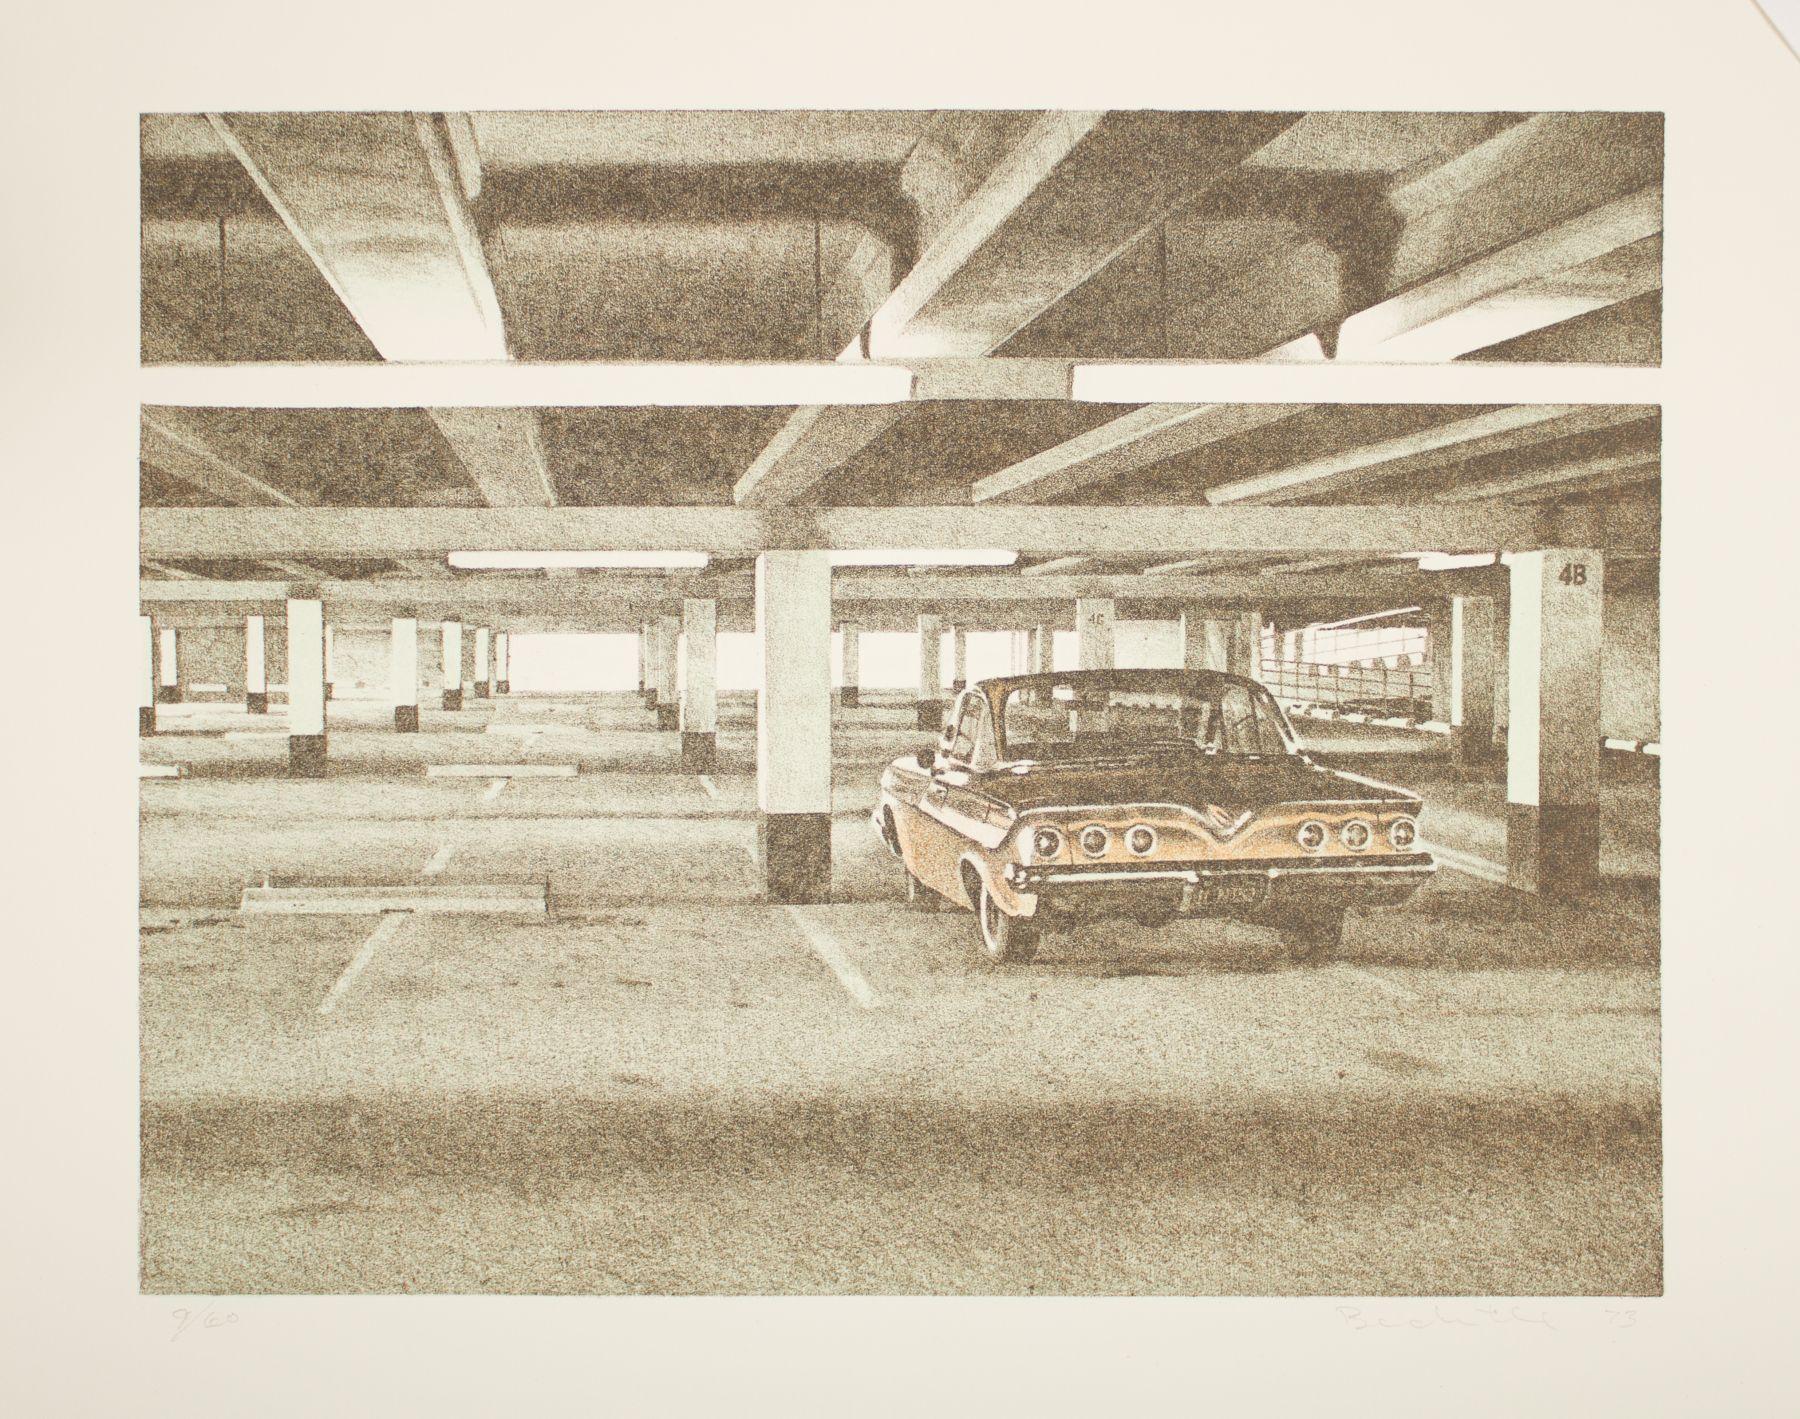 Robert Bechtle '61 Impala, 1973